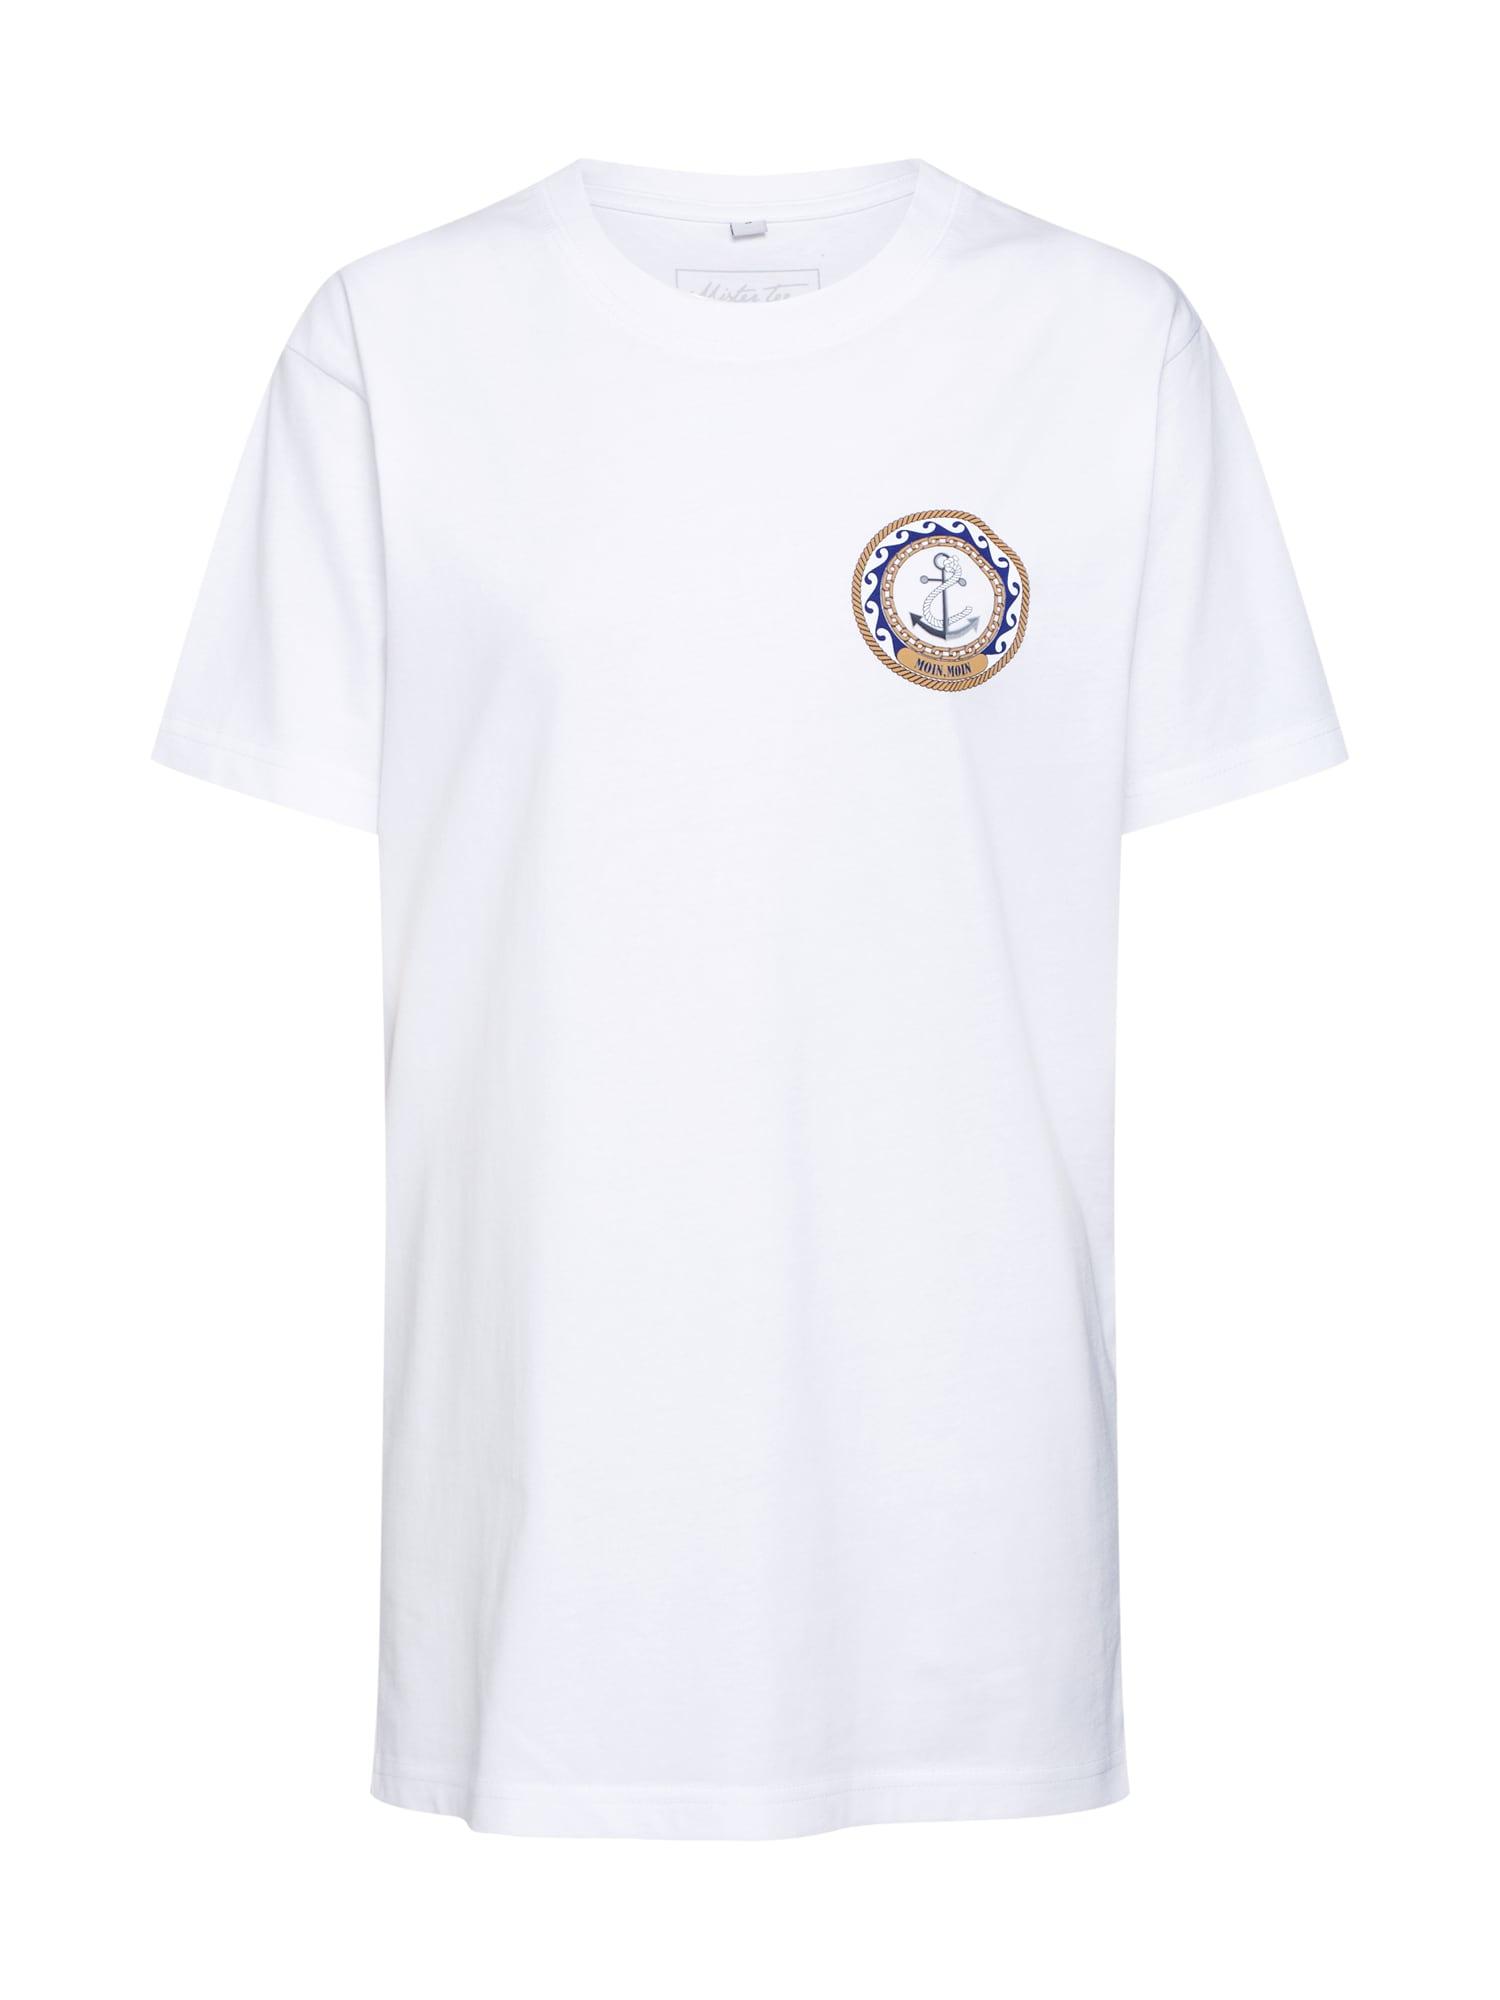 Tričko Moin Moin mix barev bílá Merchcode